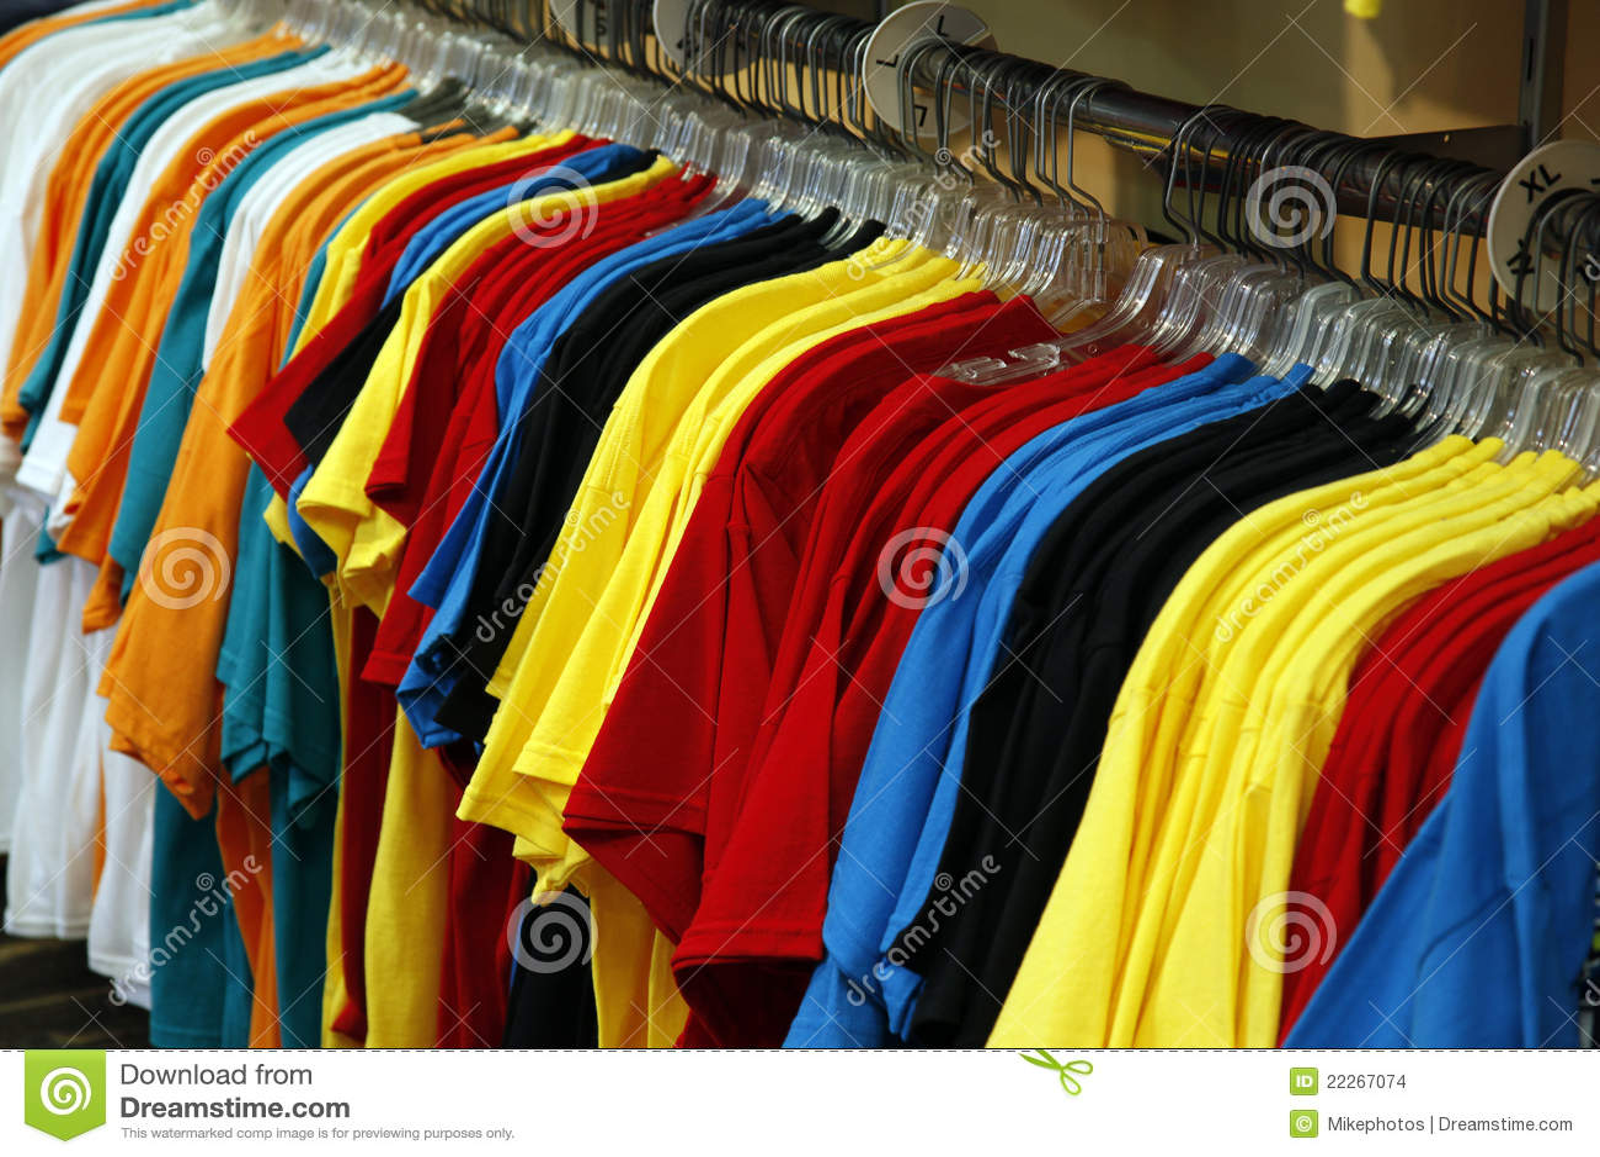 dcc99032443f ζωηρόχρωμες μπλούζες ραφ στοκ εικόνες. εικόνα από μαύρα - 22267074